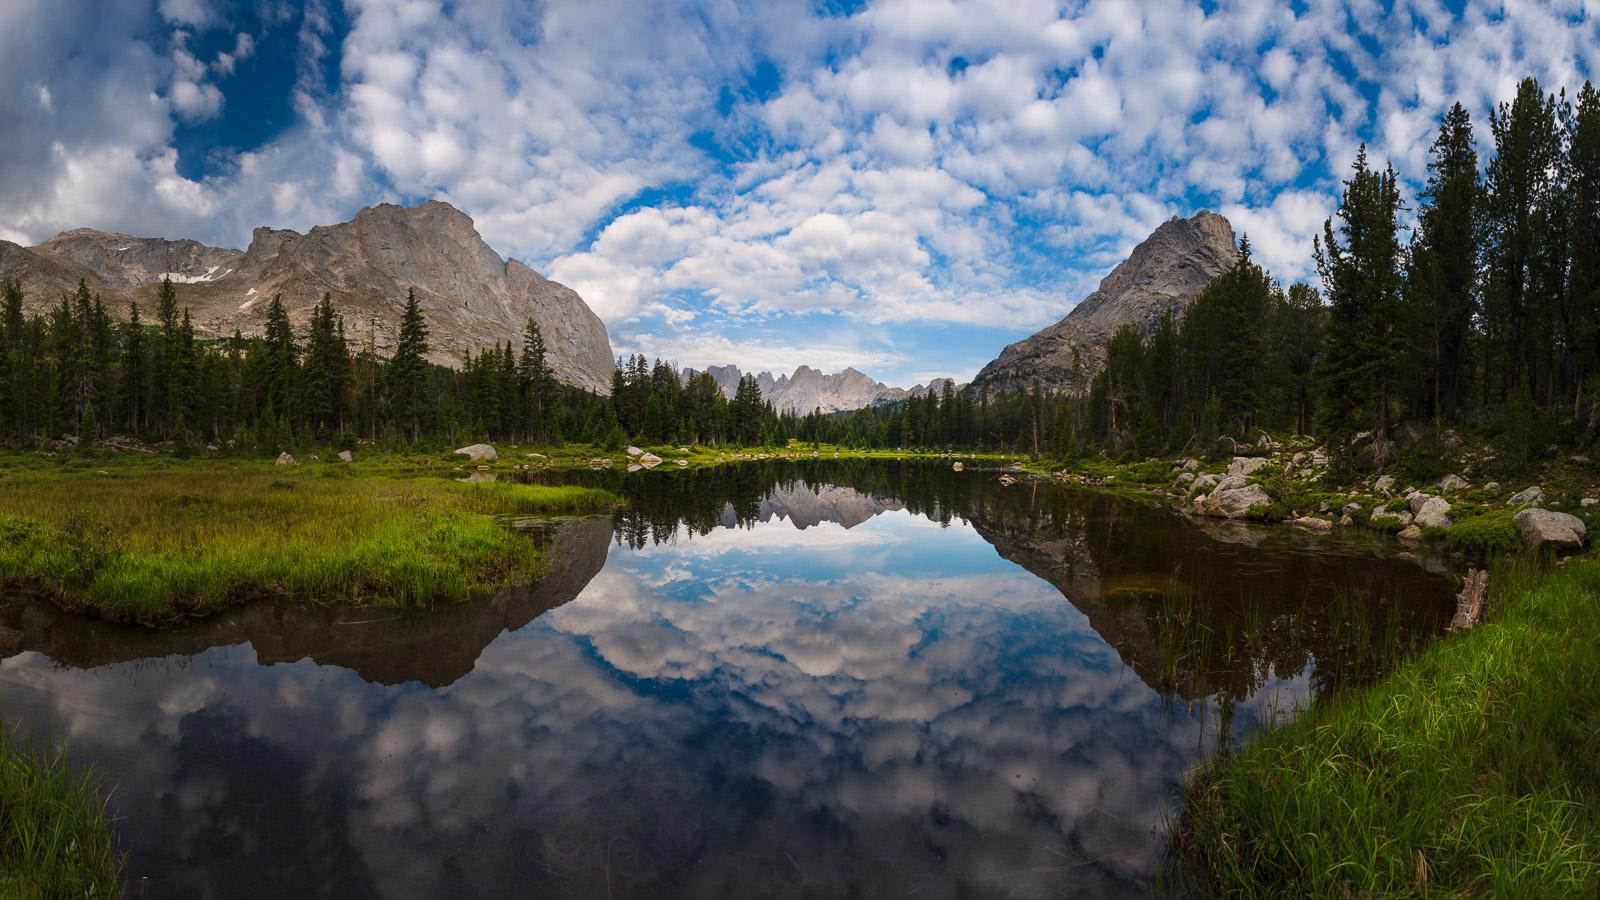 Popo Agie Wilderness, Windriver Range, Wyoming